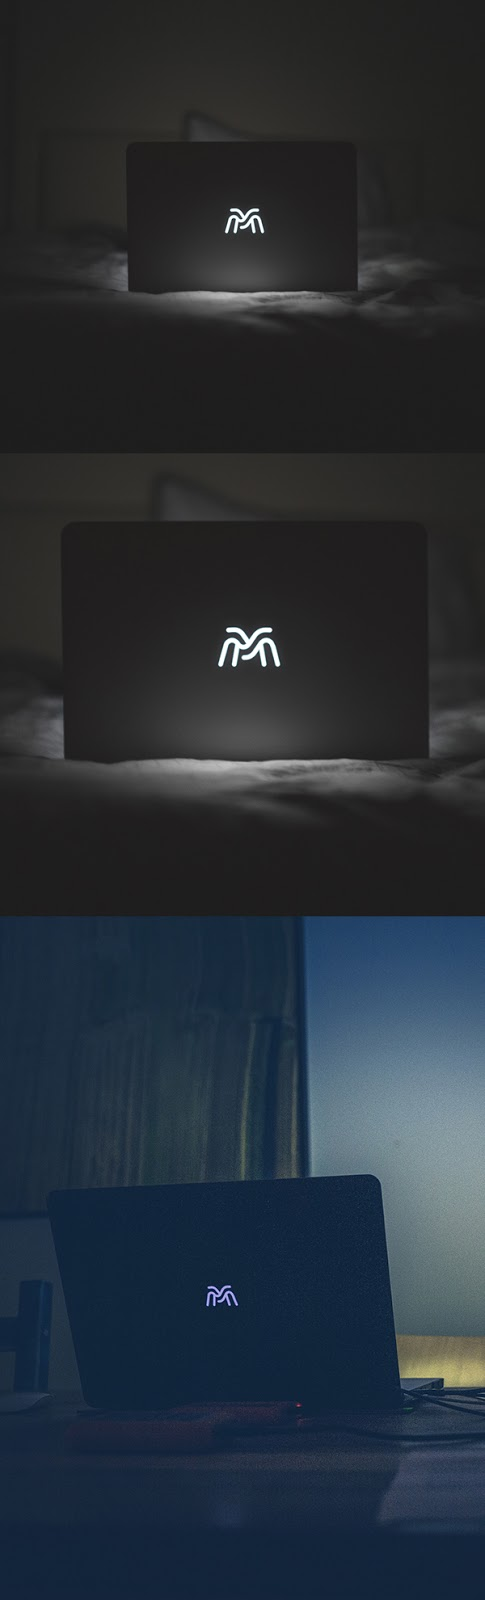 Download Free Mockup PSD 2018 - Free Backlight Macbook Logo Mockup